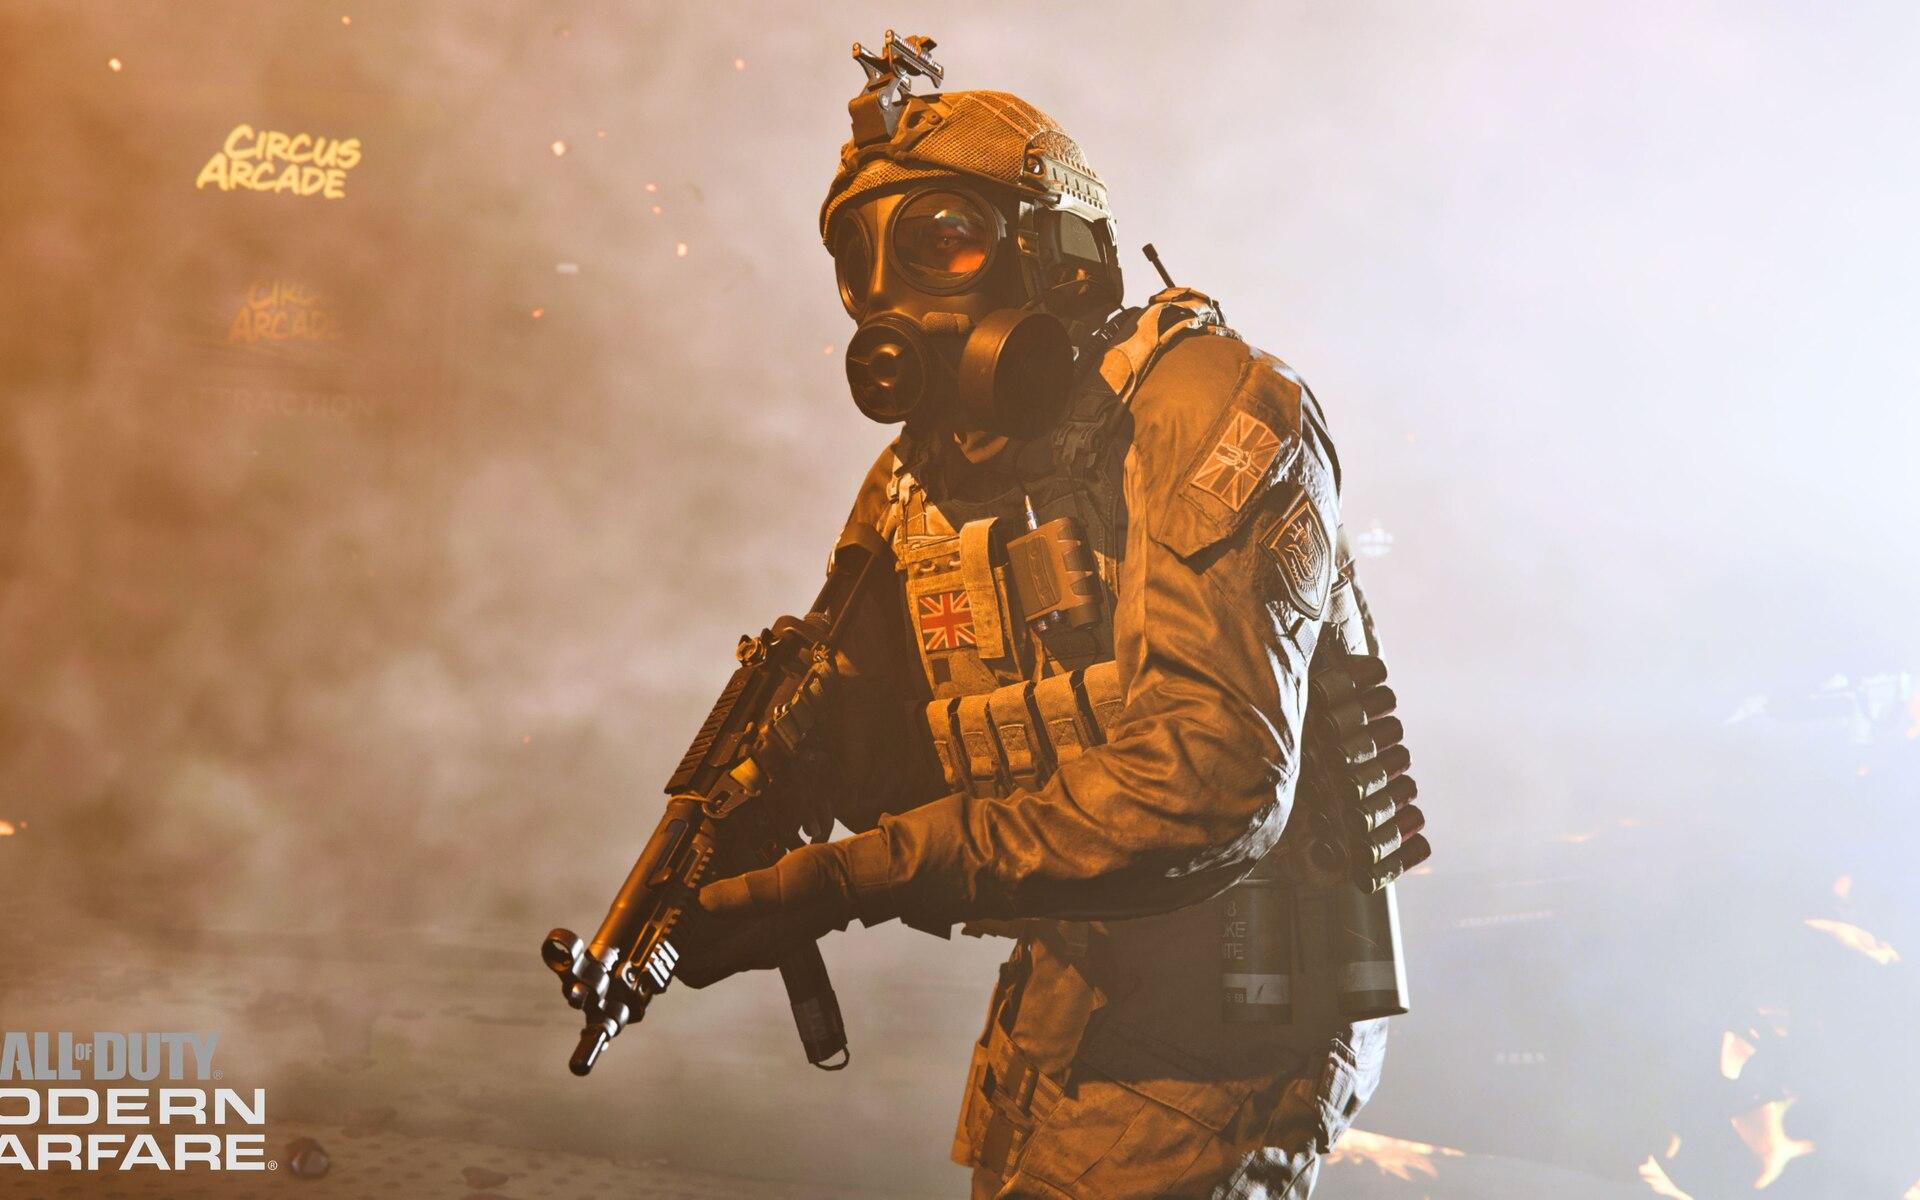 call-of-duty-modern-warfare-4k-2019-new-ji.jpg